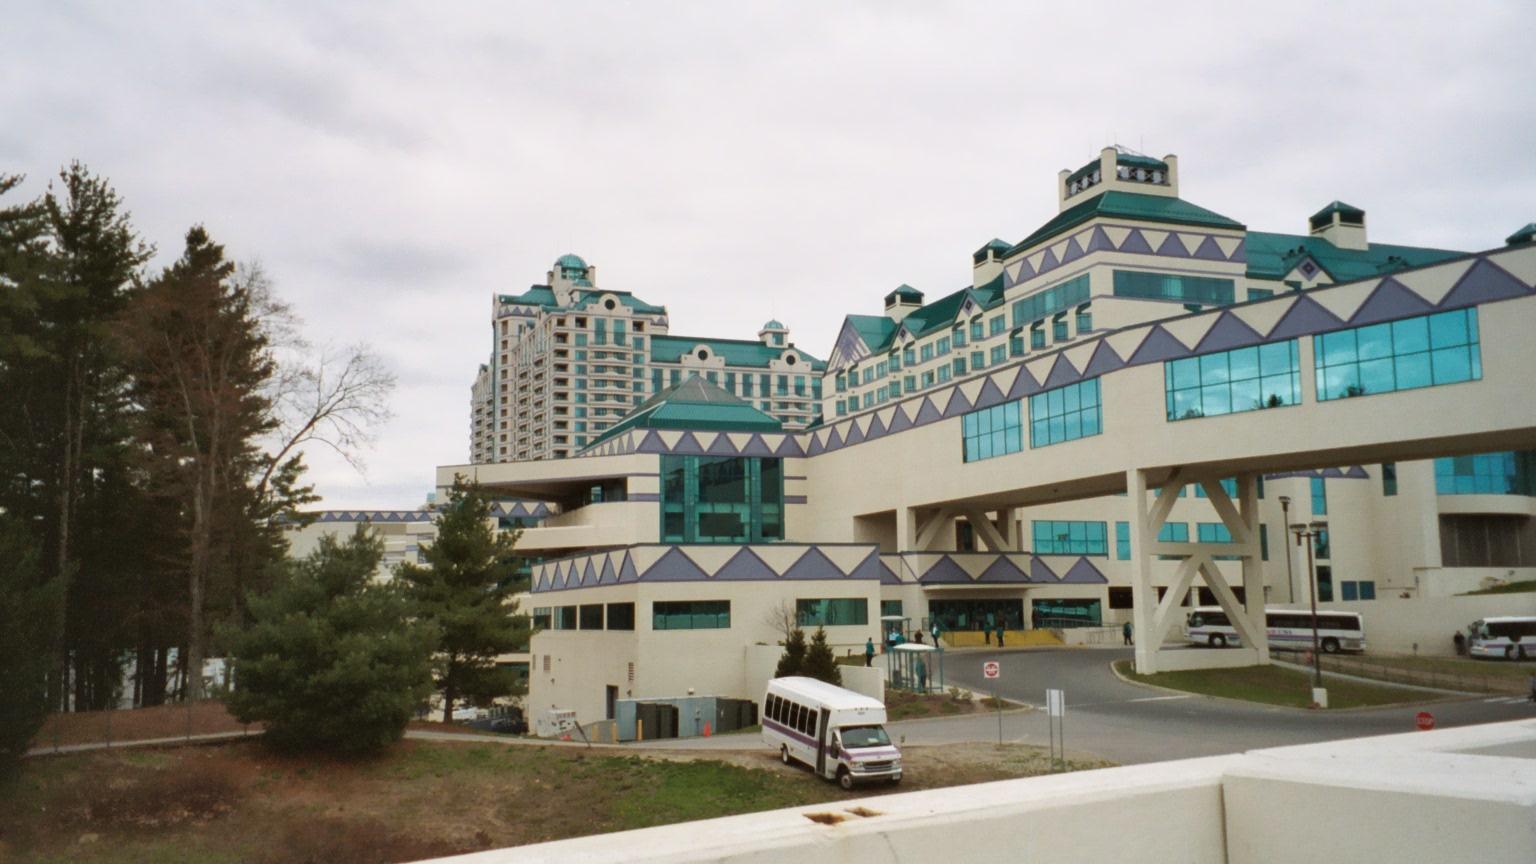 Casino foxwood in ct